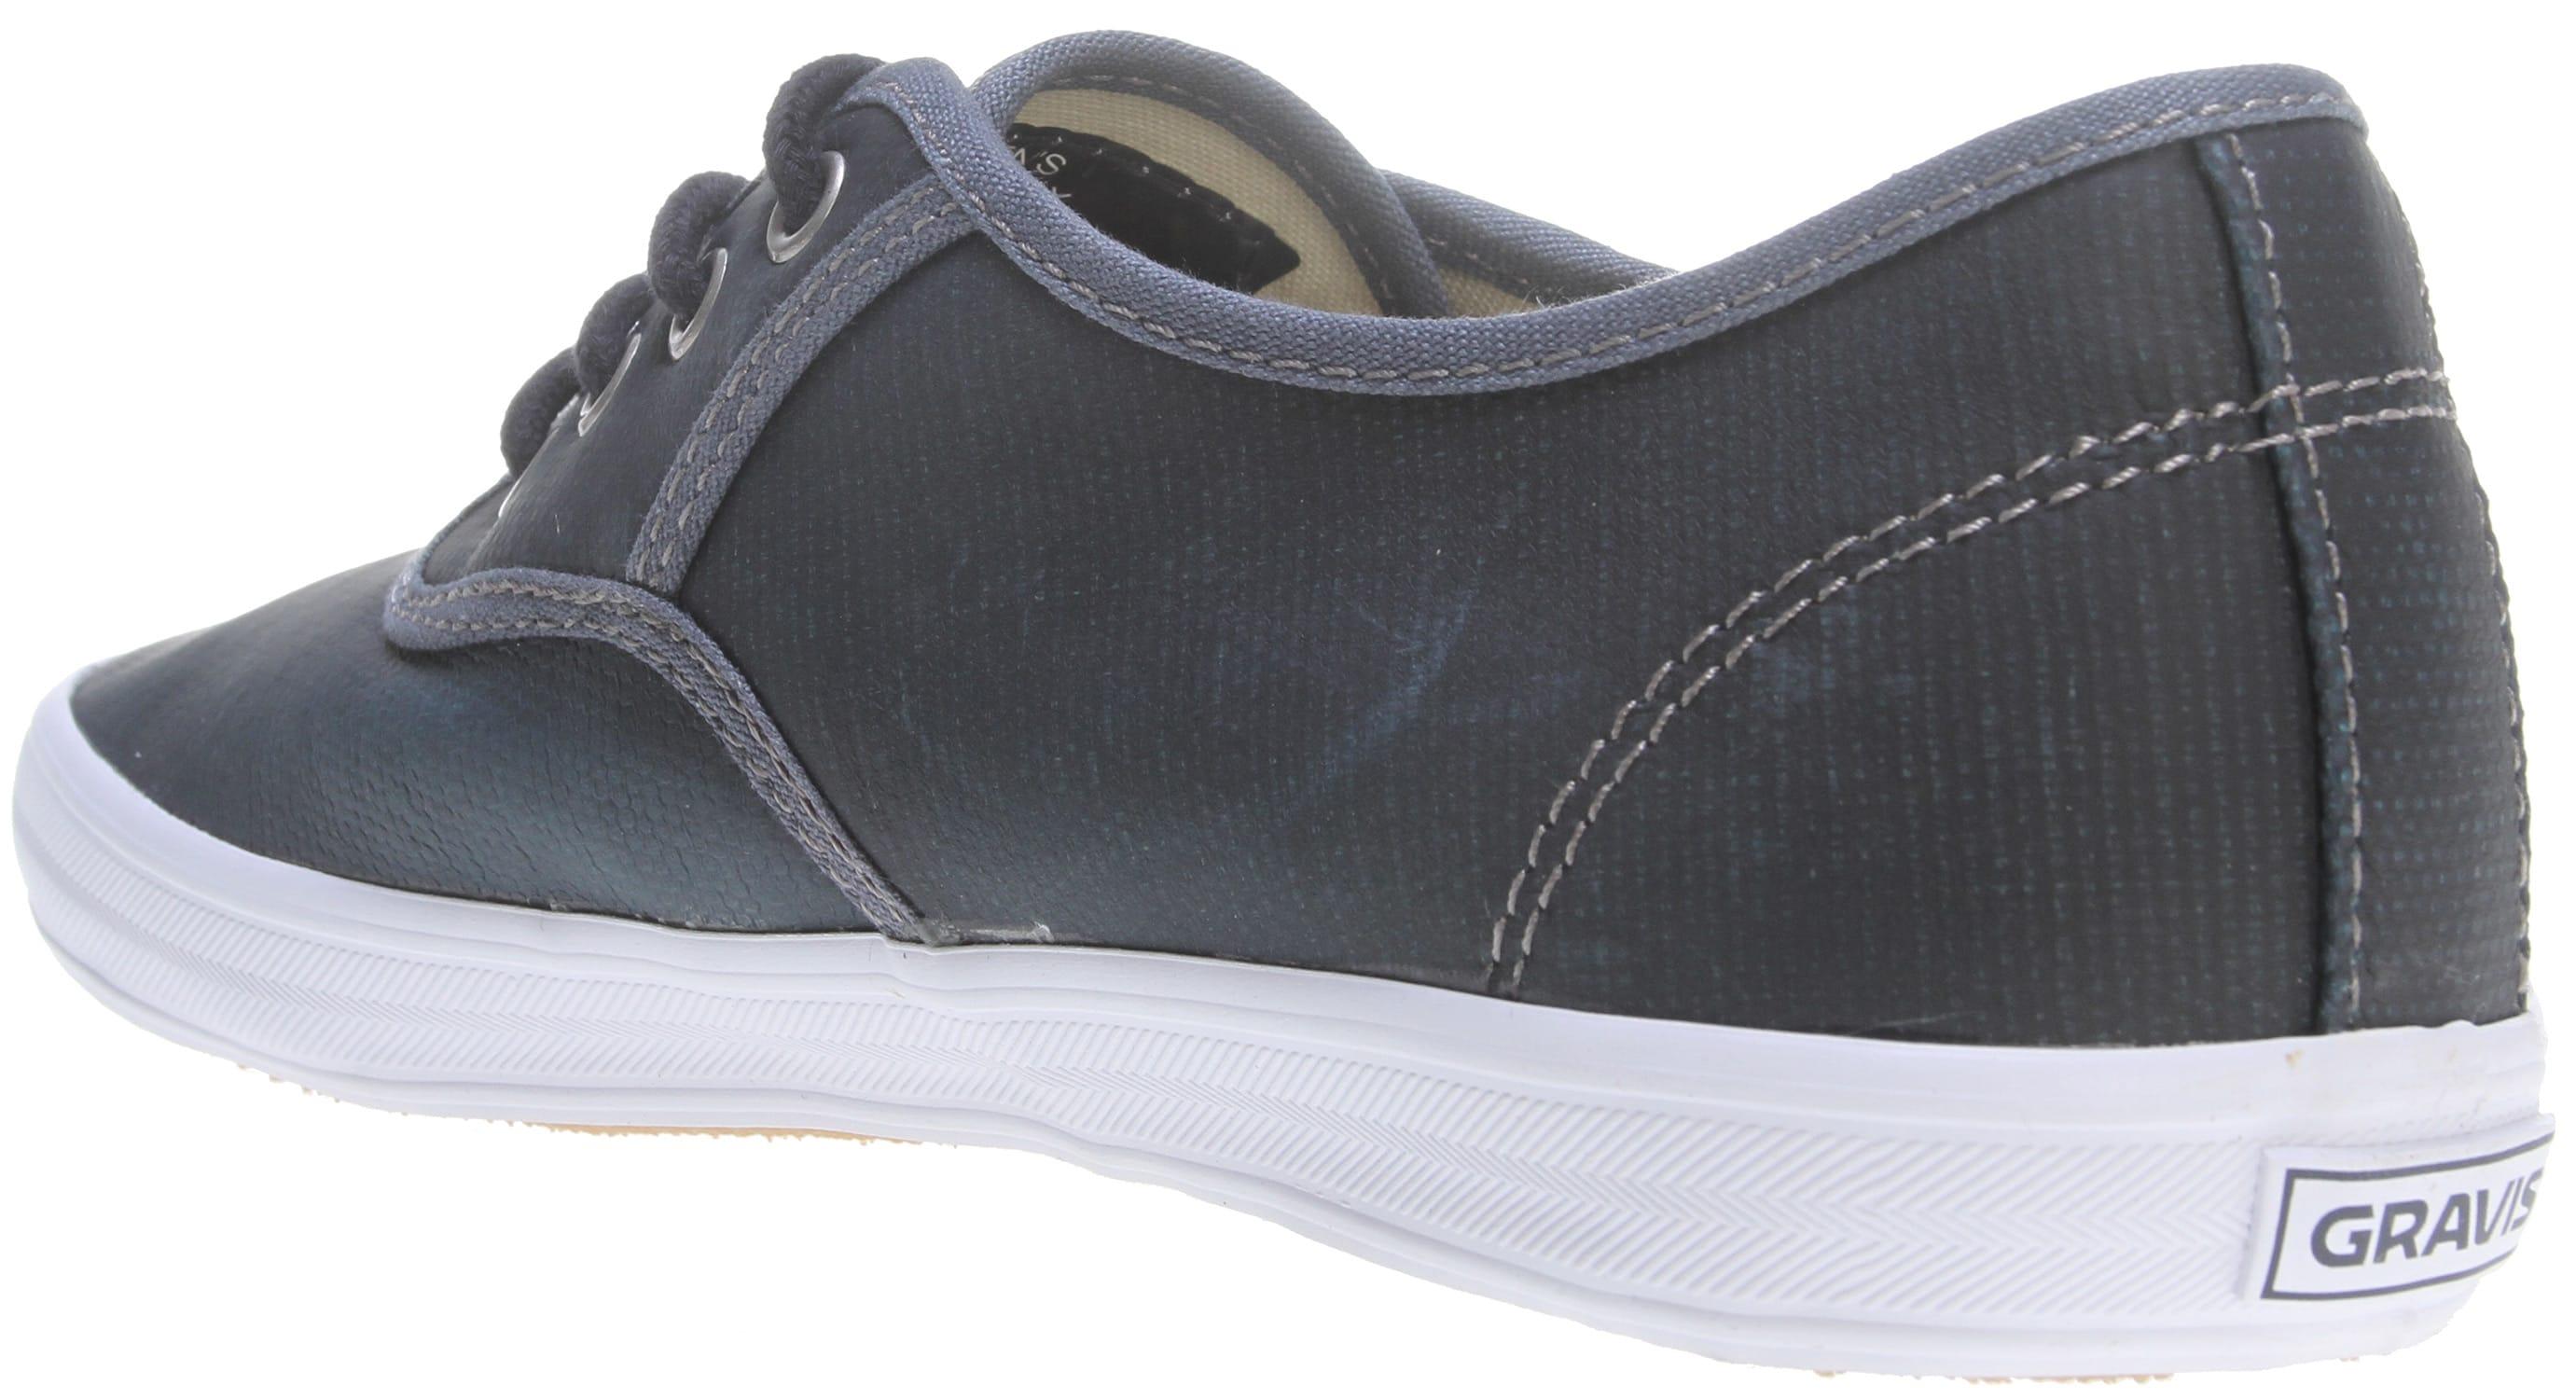 28863c94f022 Gravis Slymz Wax Shoes - thumbnail 3